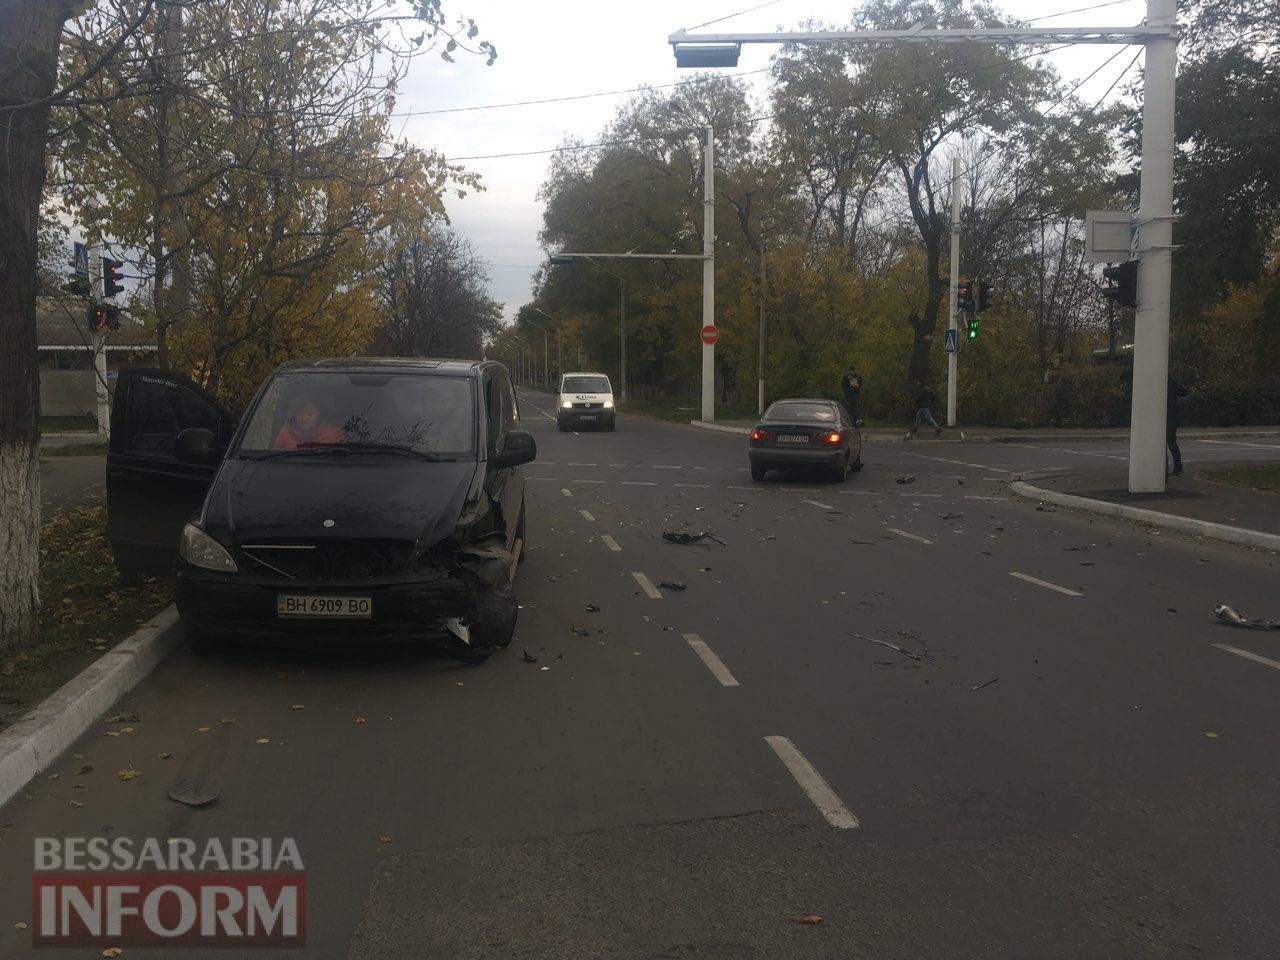 5a0c04e61390e_6k3462 В Измаиле проезд на запрещающий сигнал светофора стал причиной очередного ДТП